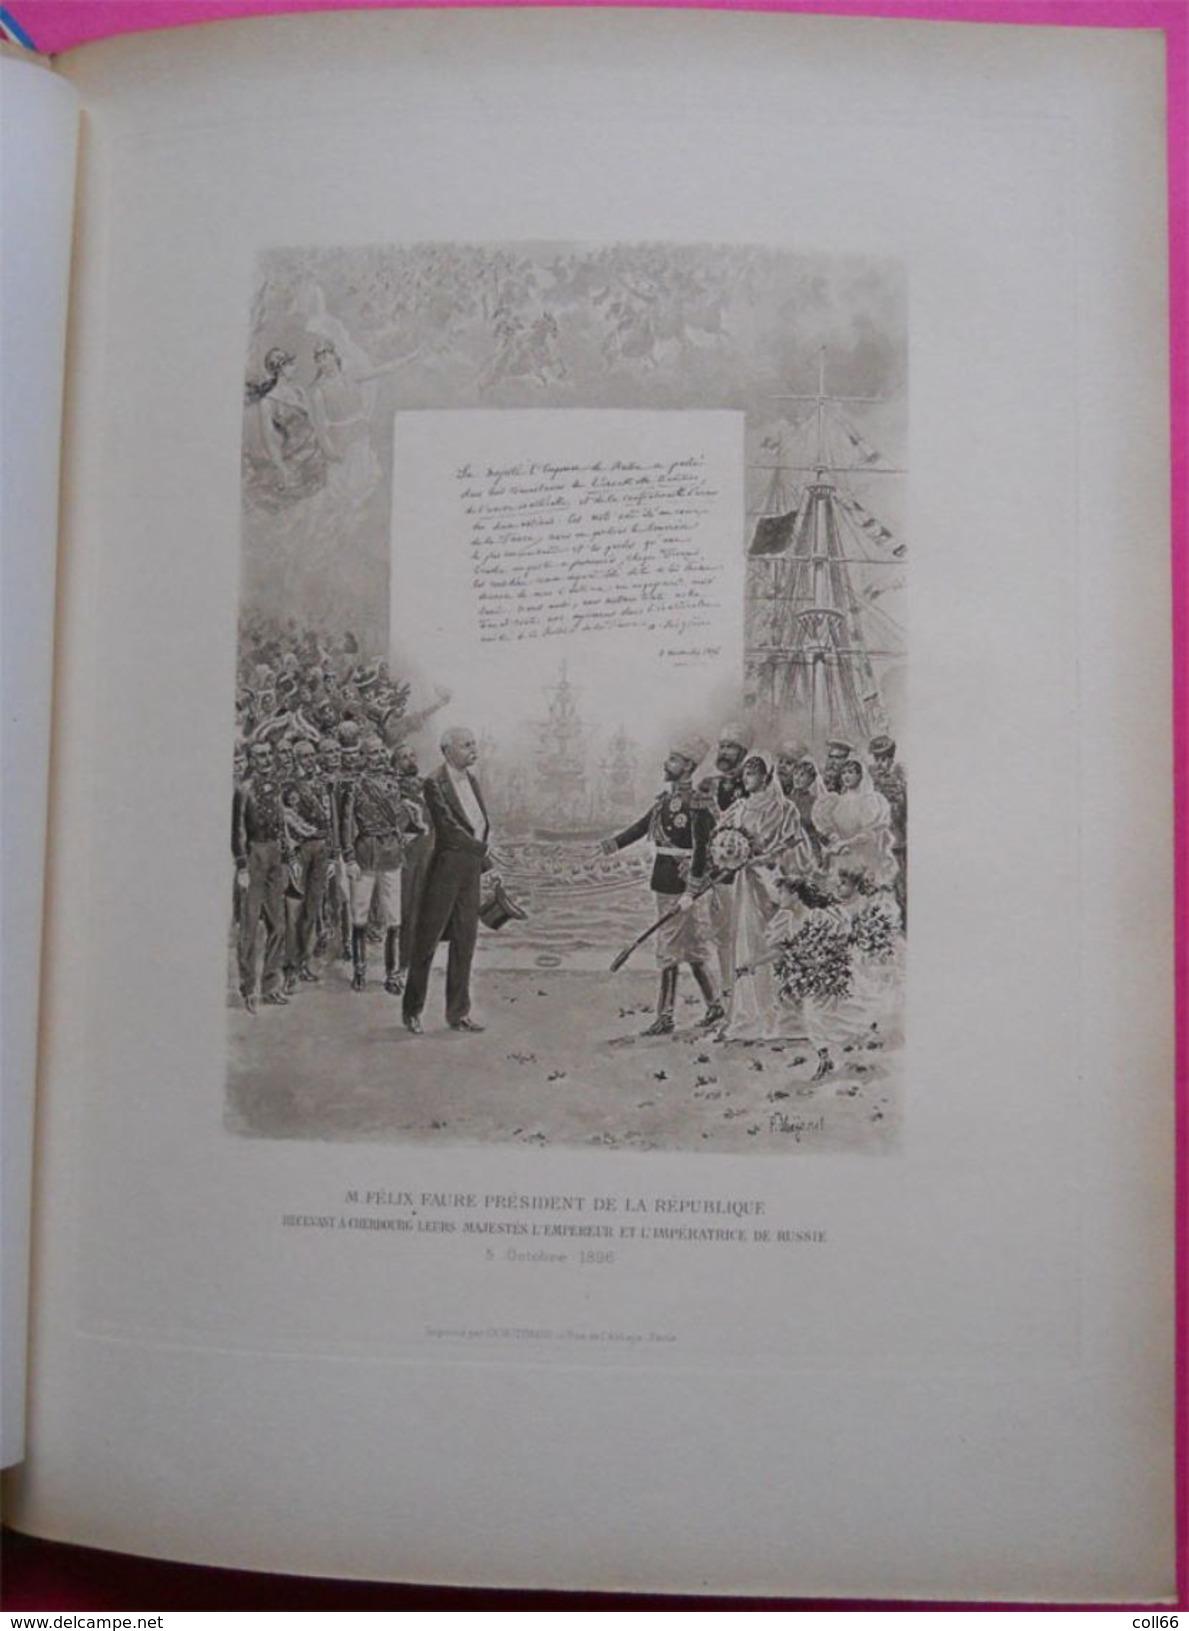 RARE 1891-1898 Le Livre D'Or De L'Alliance Franco-Russe De Philippe Deschamps Tsar Alexandre III Nicolas II - Books, Magazines, Comics